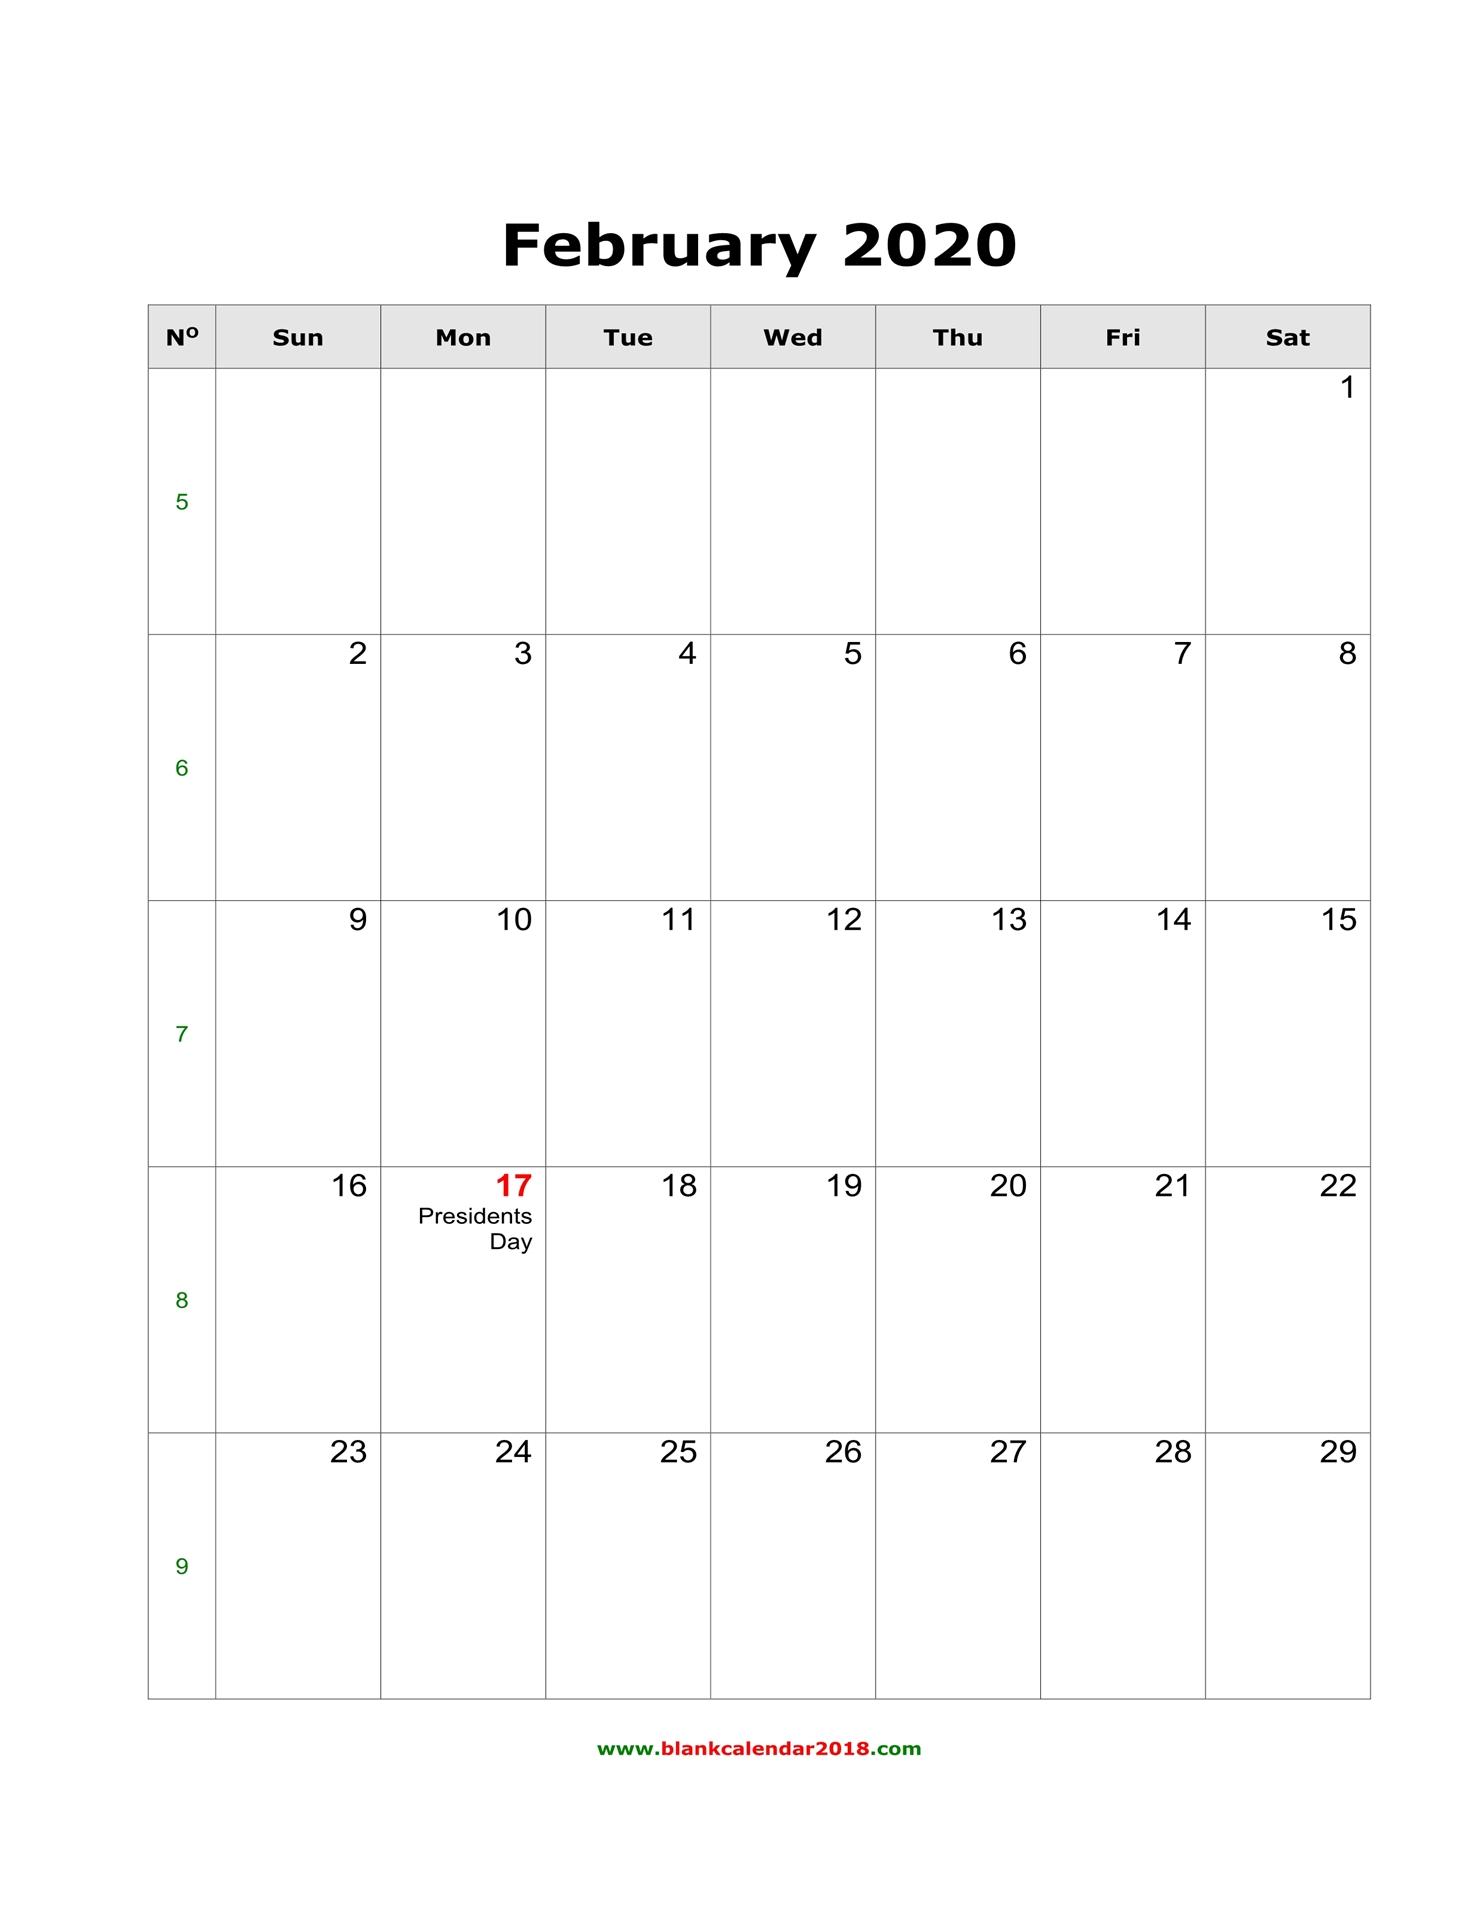 Blank Calendar For February 2020 inside Wincalendar January 2020